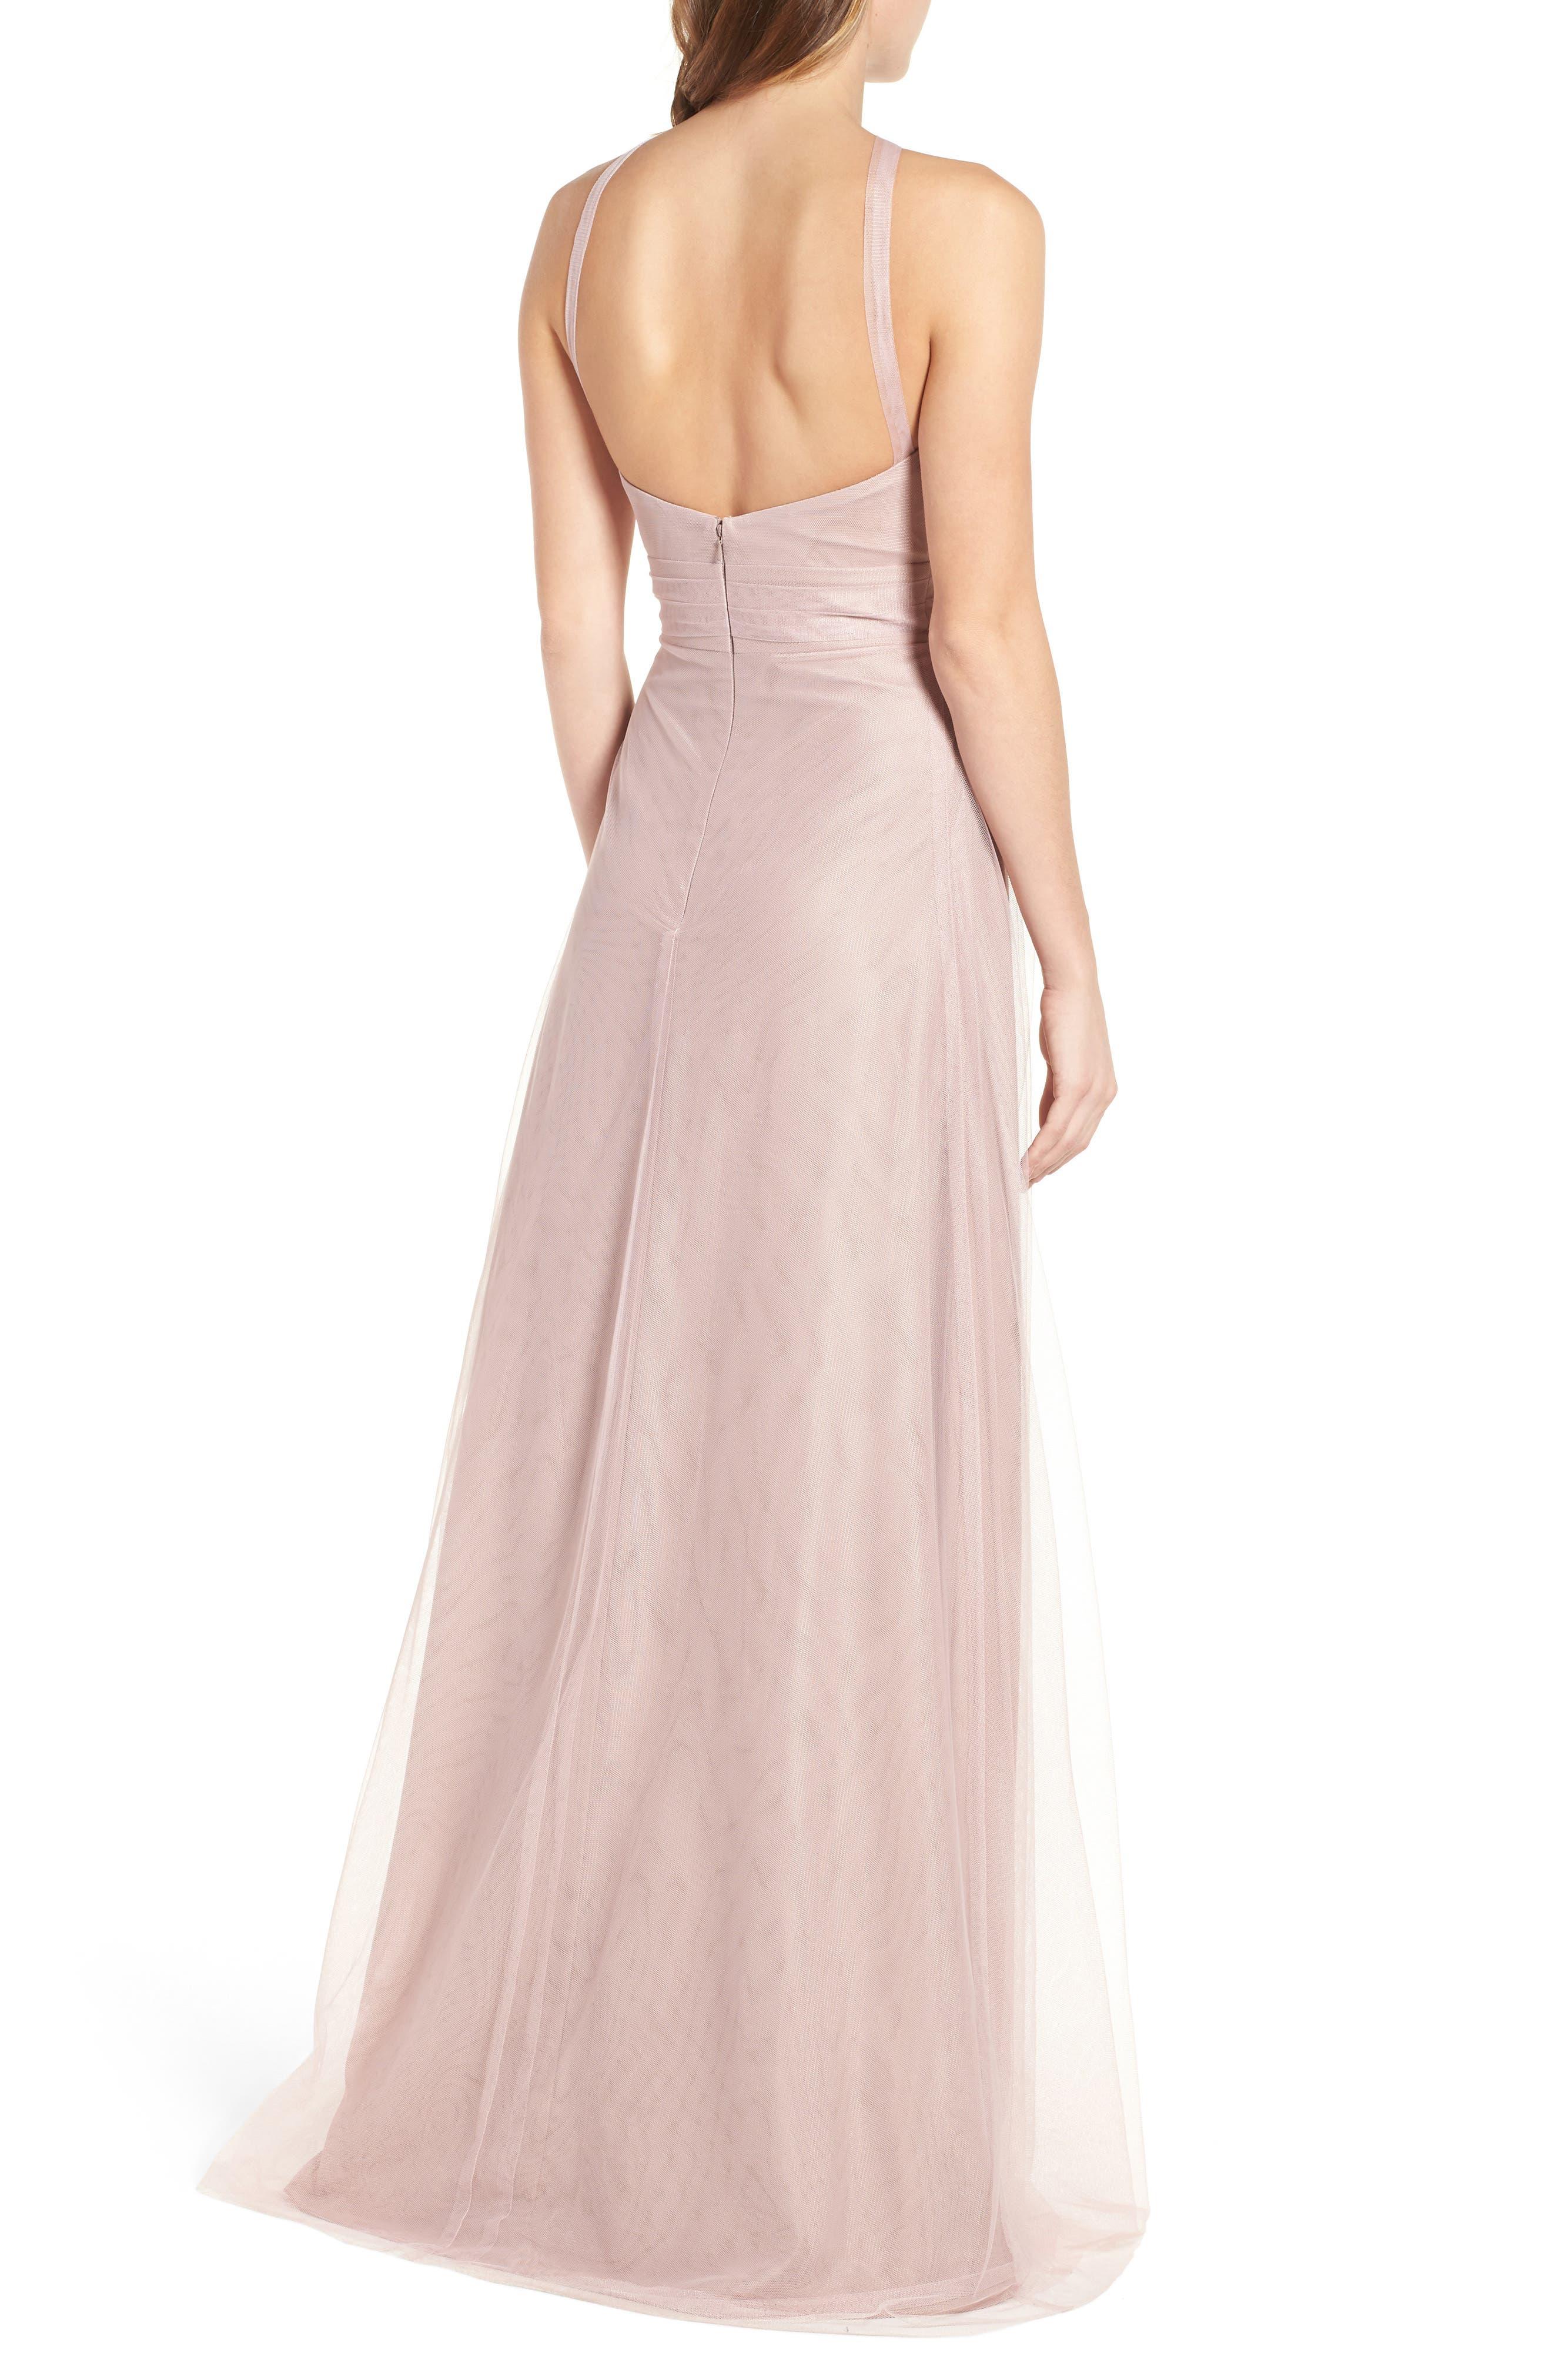 Alternate Image 3  - Monique Lhuillier Bridesmaids Tulle Halter Style Gown